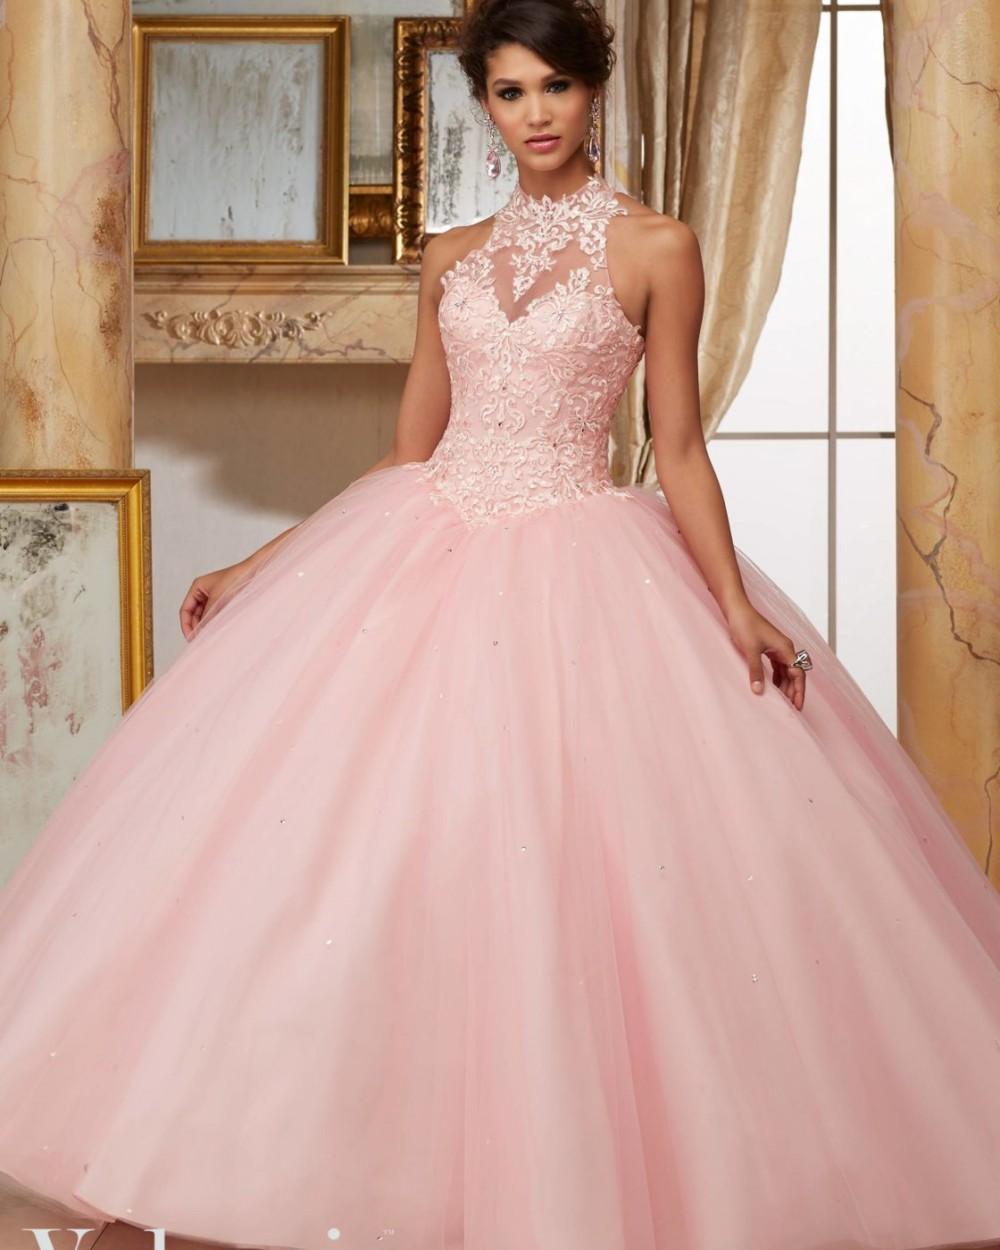 Bonito Vestidos De Novia Estilo Corsé Composición - Colección de ...